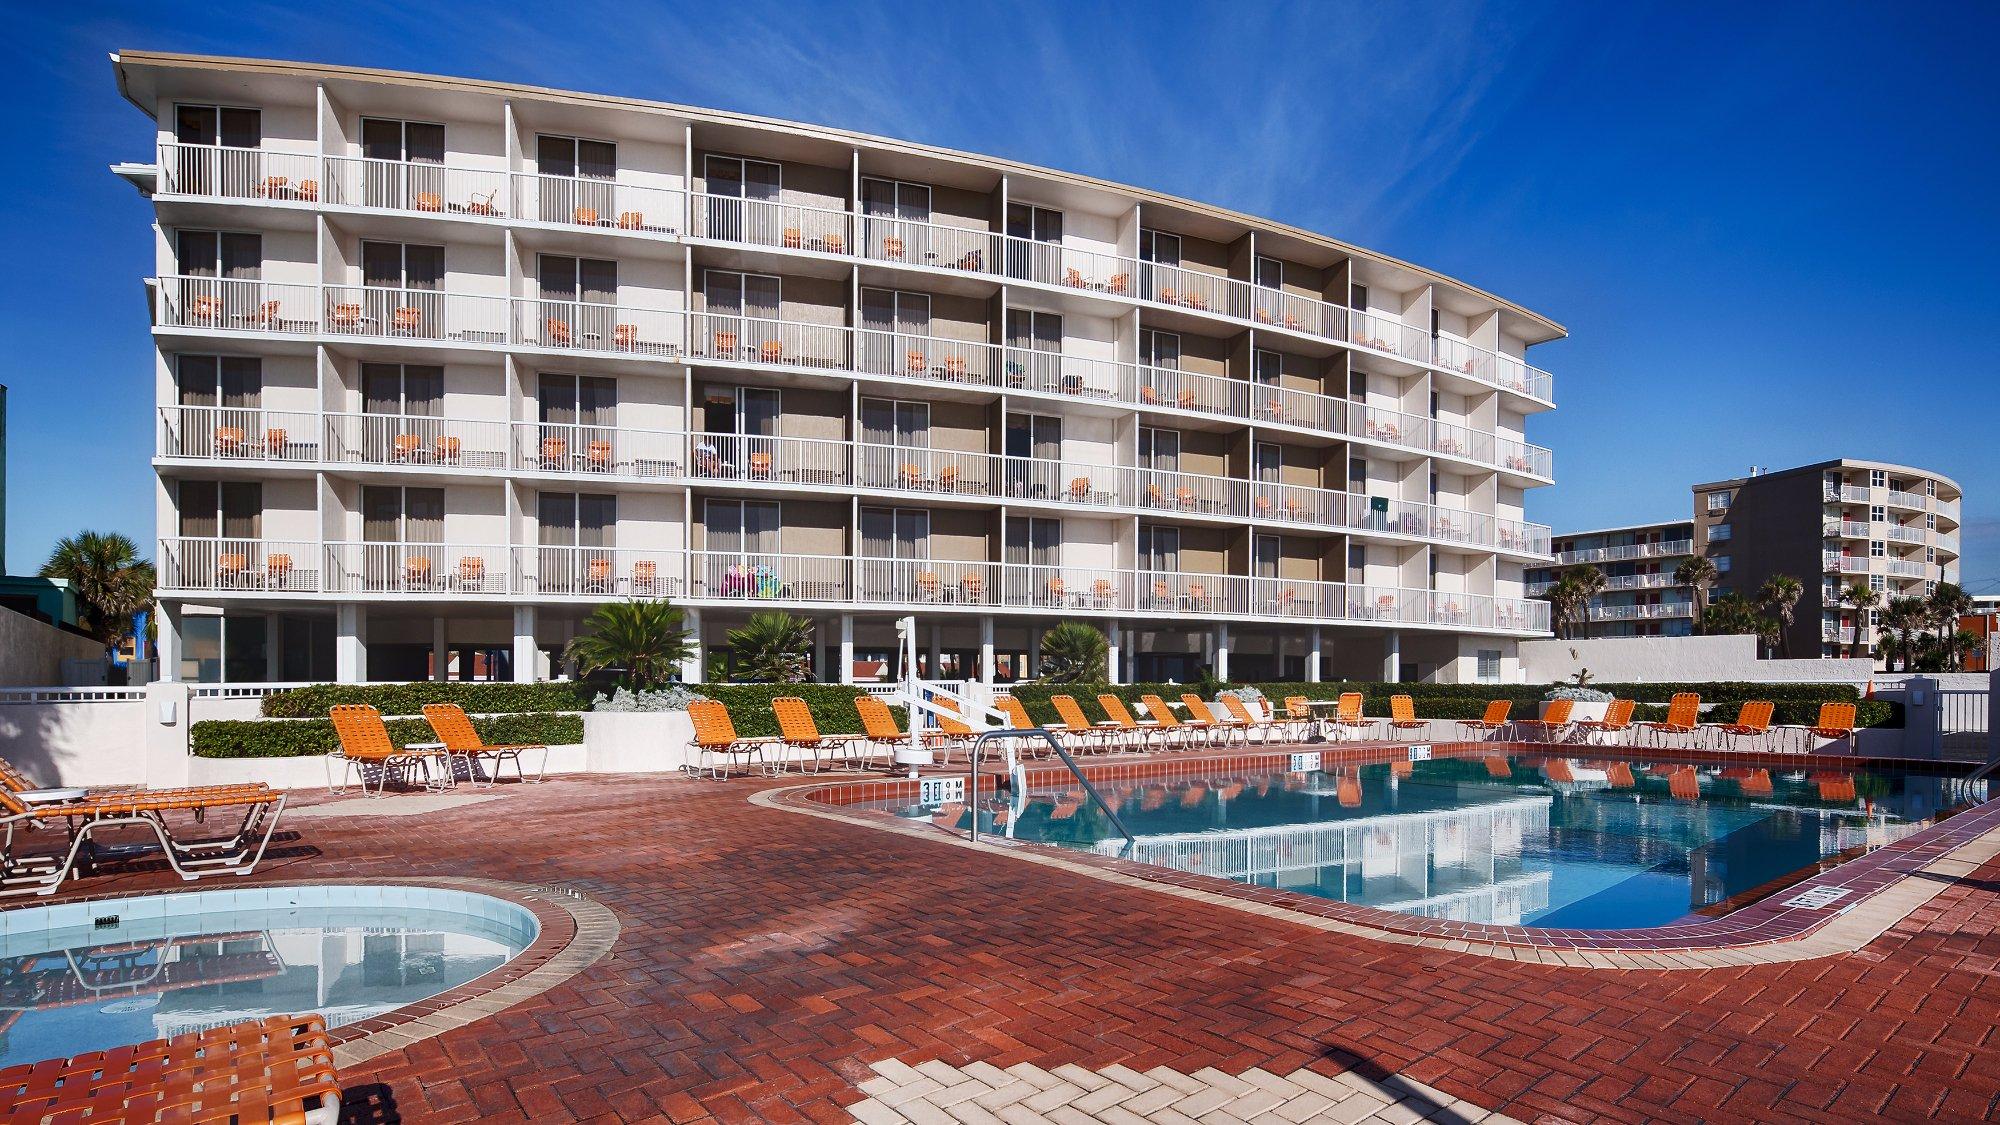 Best western daytona inn seabreeze updated 2017 prices hotel reviews daytona beach fl tripadvisor